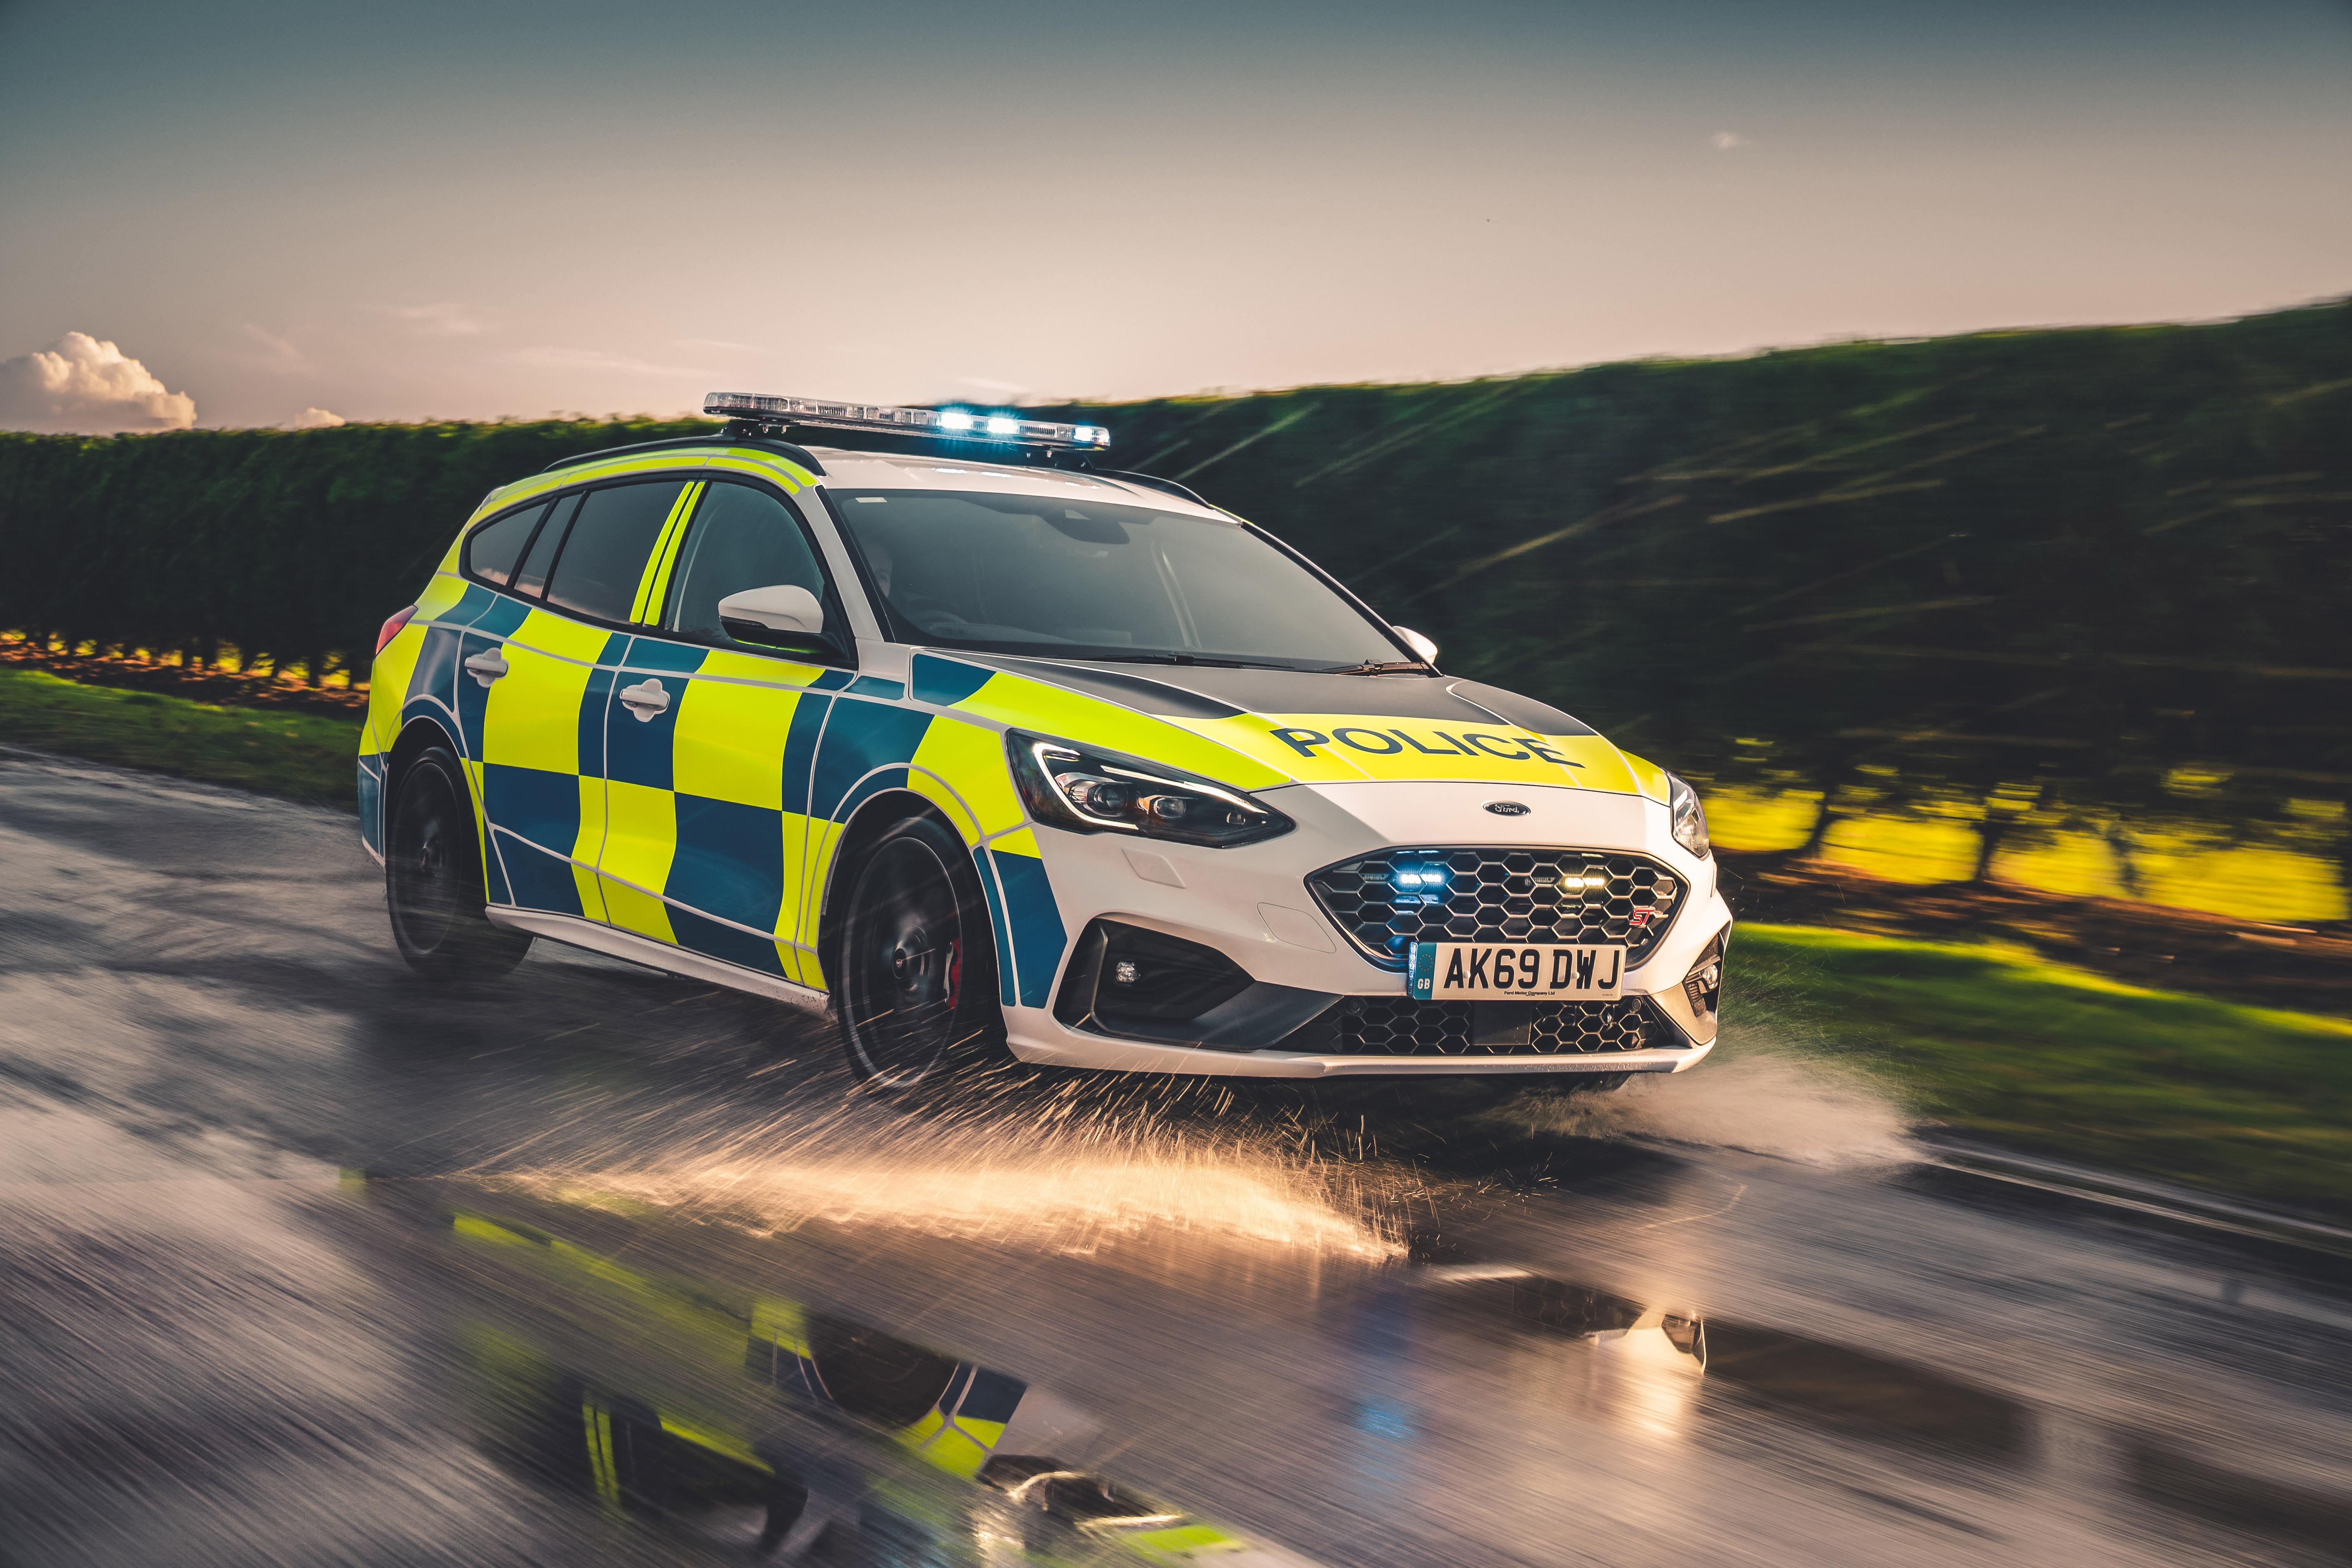 Ford Focus police car